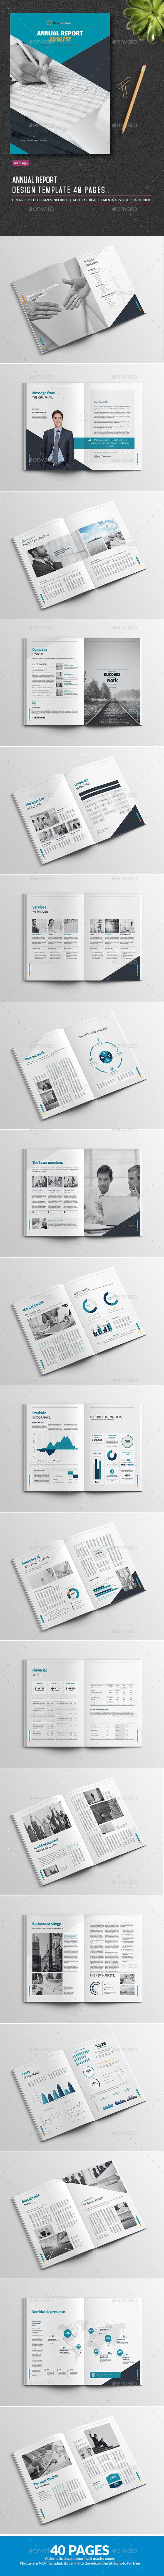 Annual Report 2016/17 - Informational Brochures